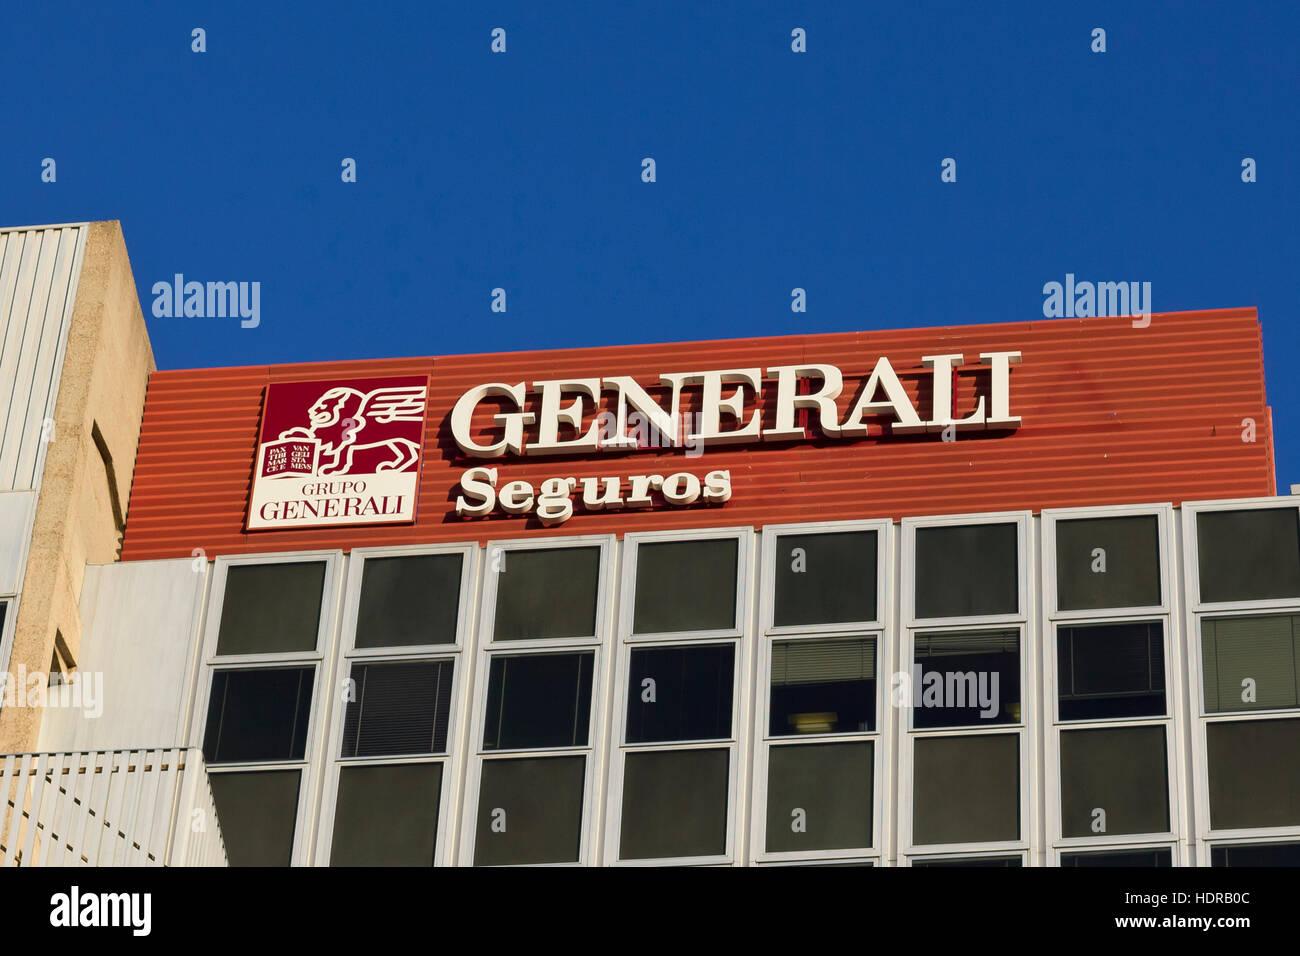 Generali Stockfotos Generali Bilder Alamy